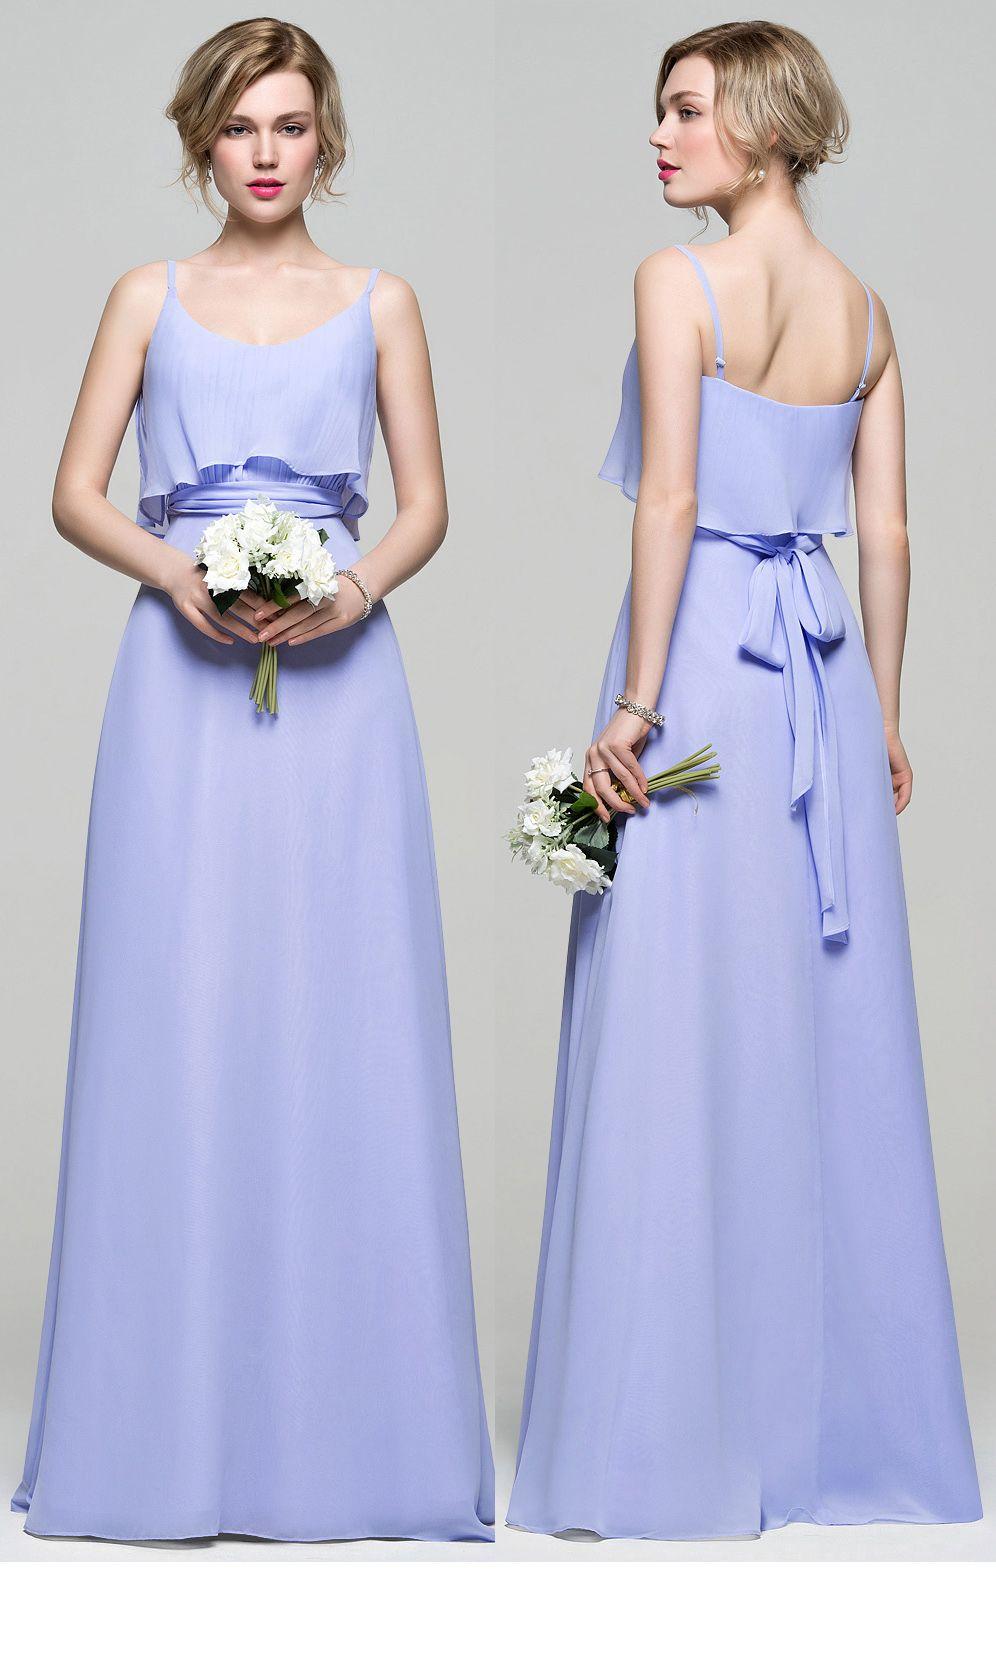 Lavender bridesmaid dress jjshouse jjshousebridesmaiddress lavender bridesmaid dress jjshouse jjshousebridesmaiddress ombrellifo Image collections